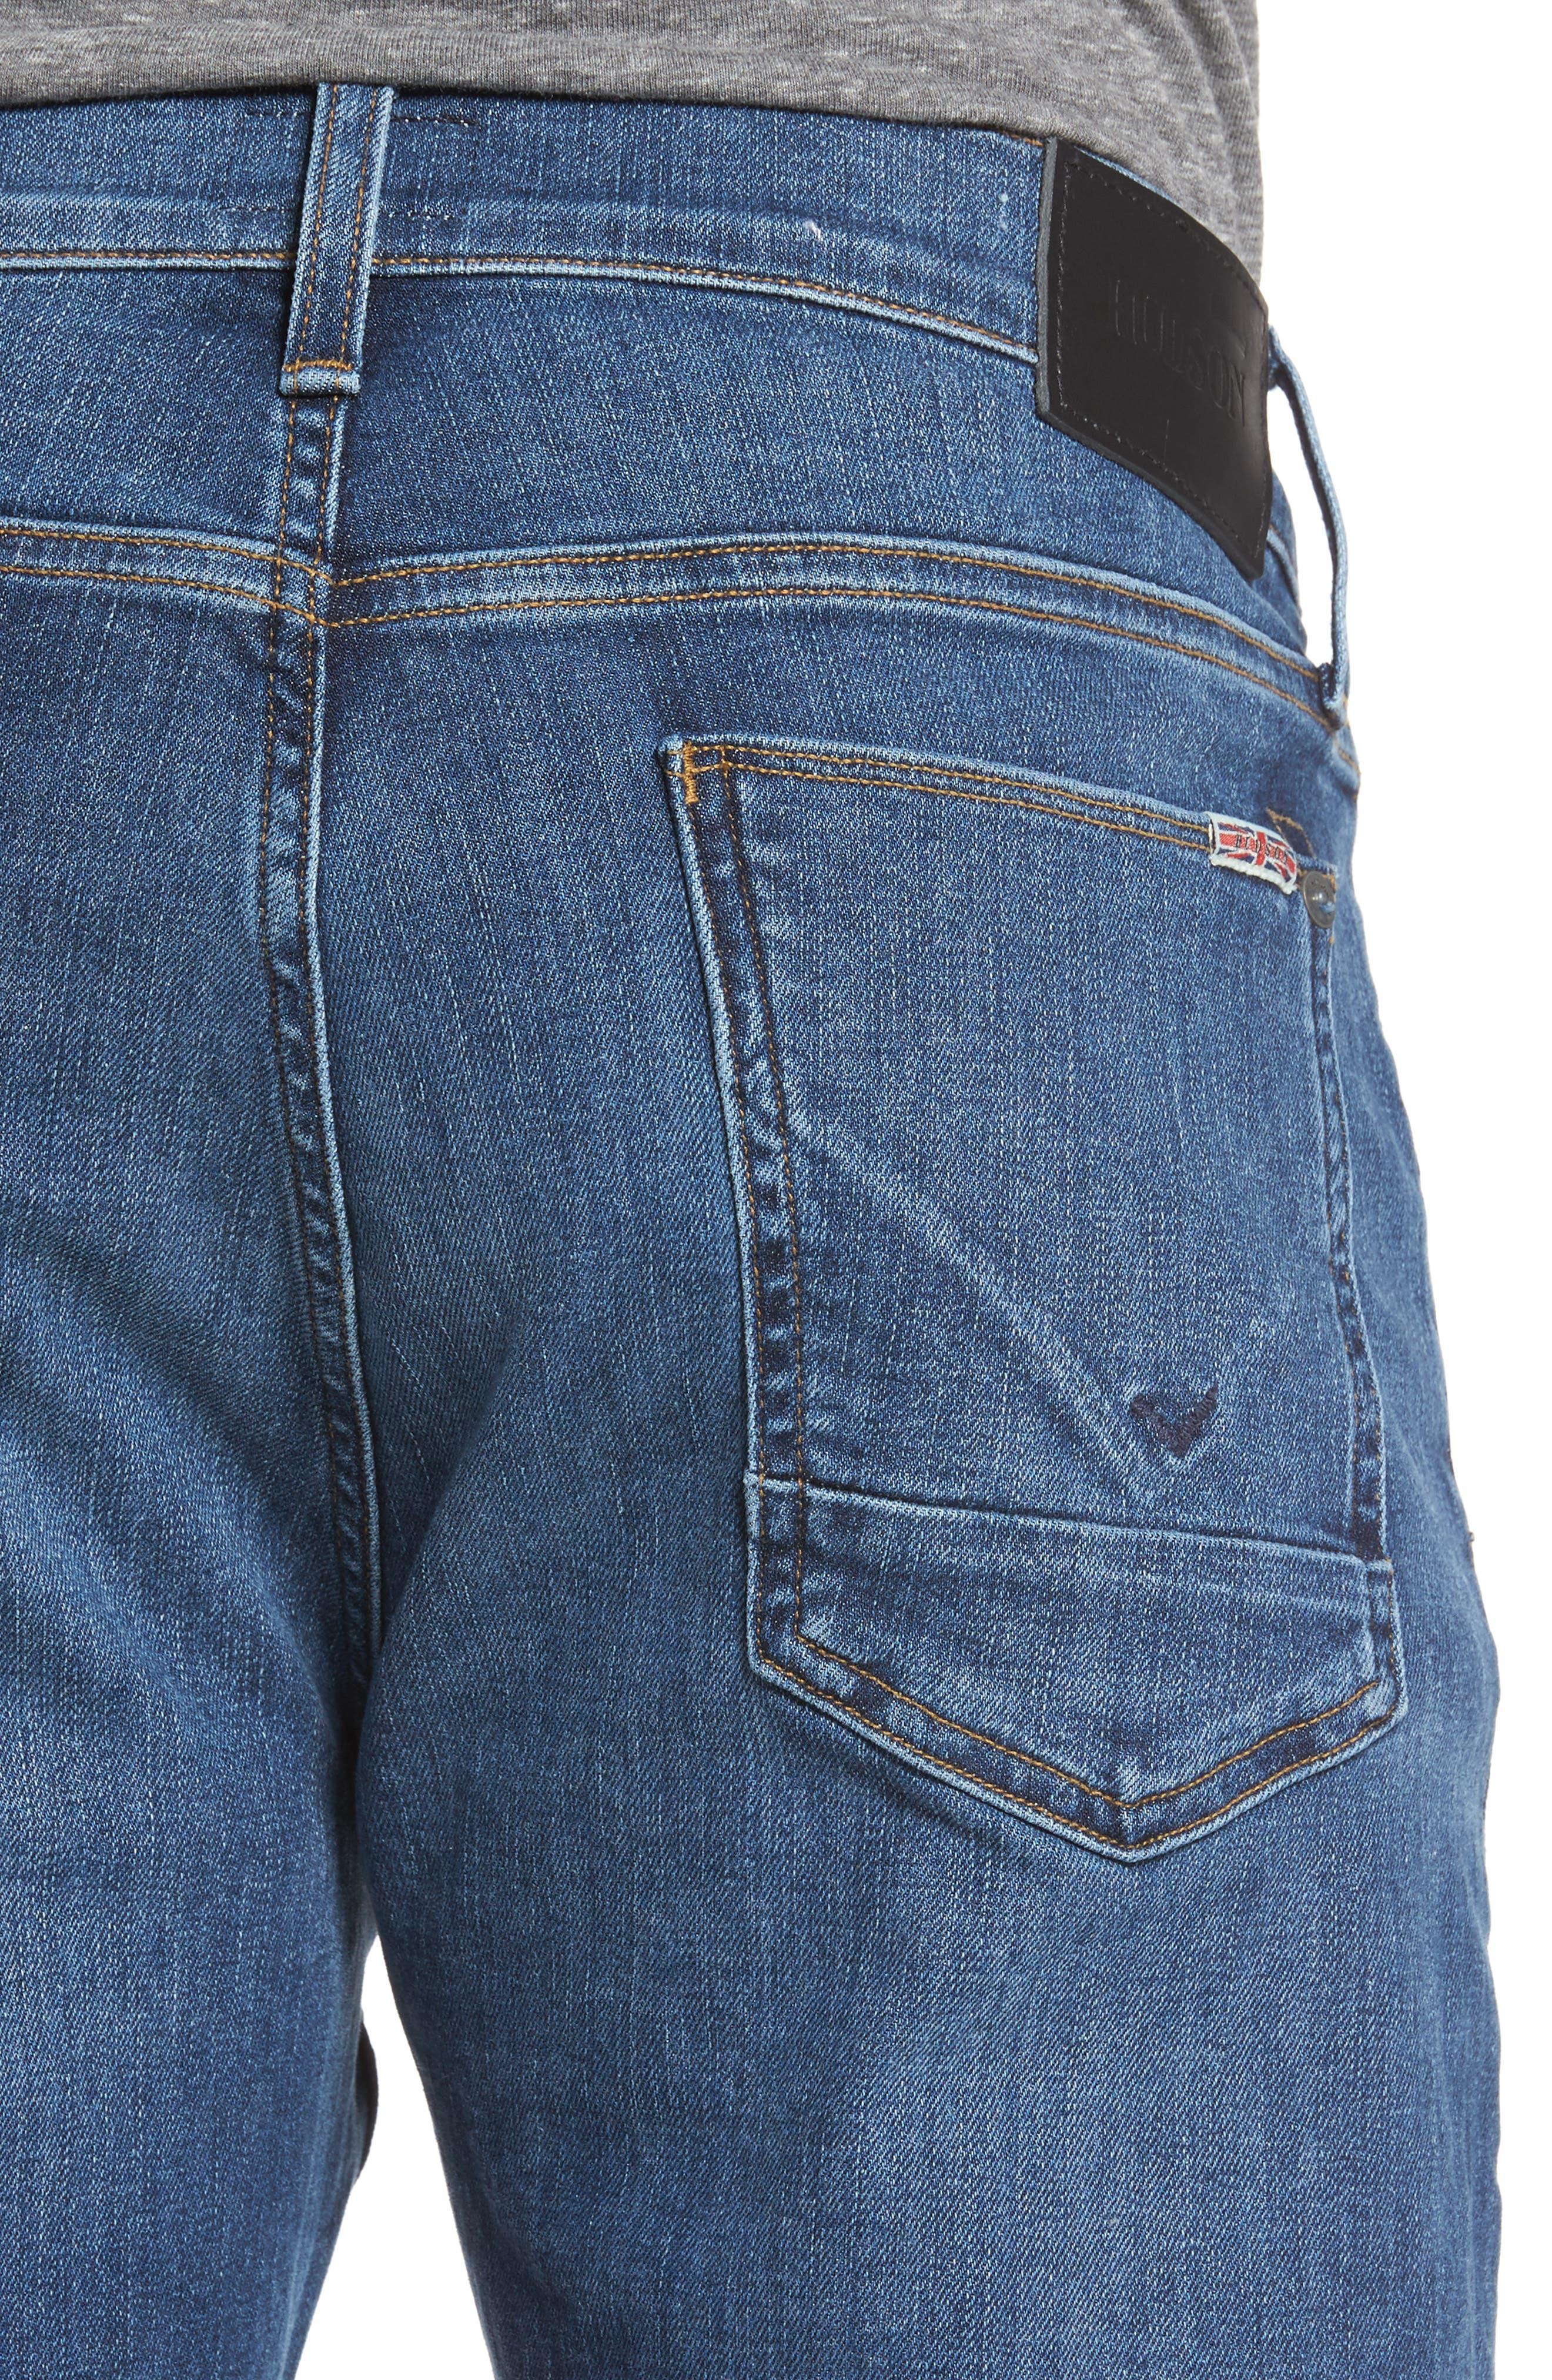 Byron Slim Straight Leg Jeans,                             Alternate thumbnail 4, color,                             421